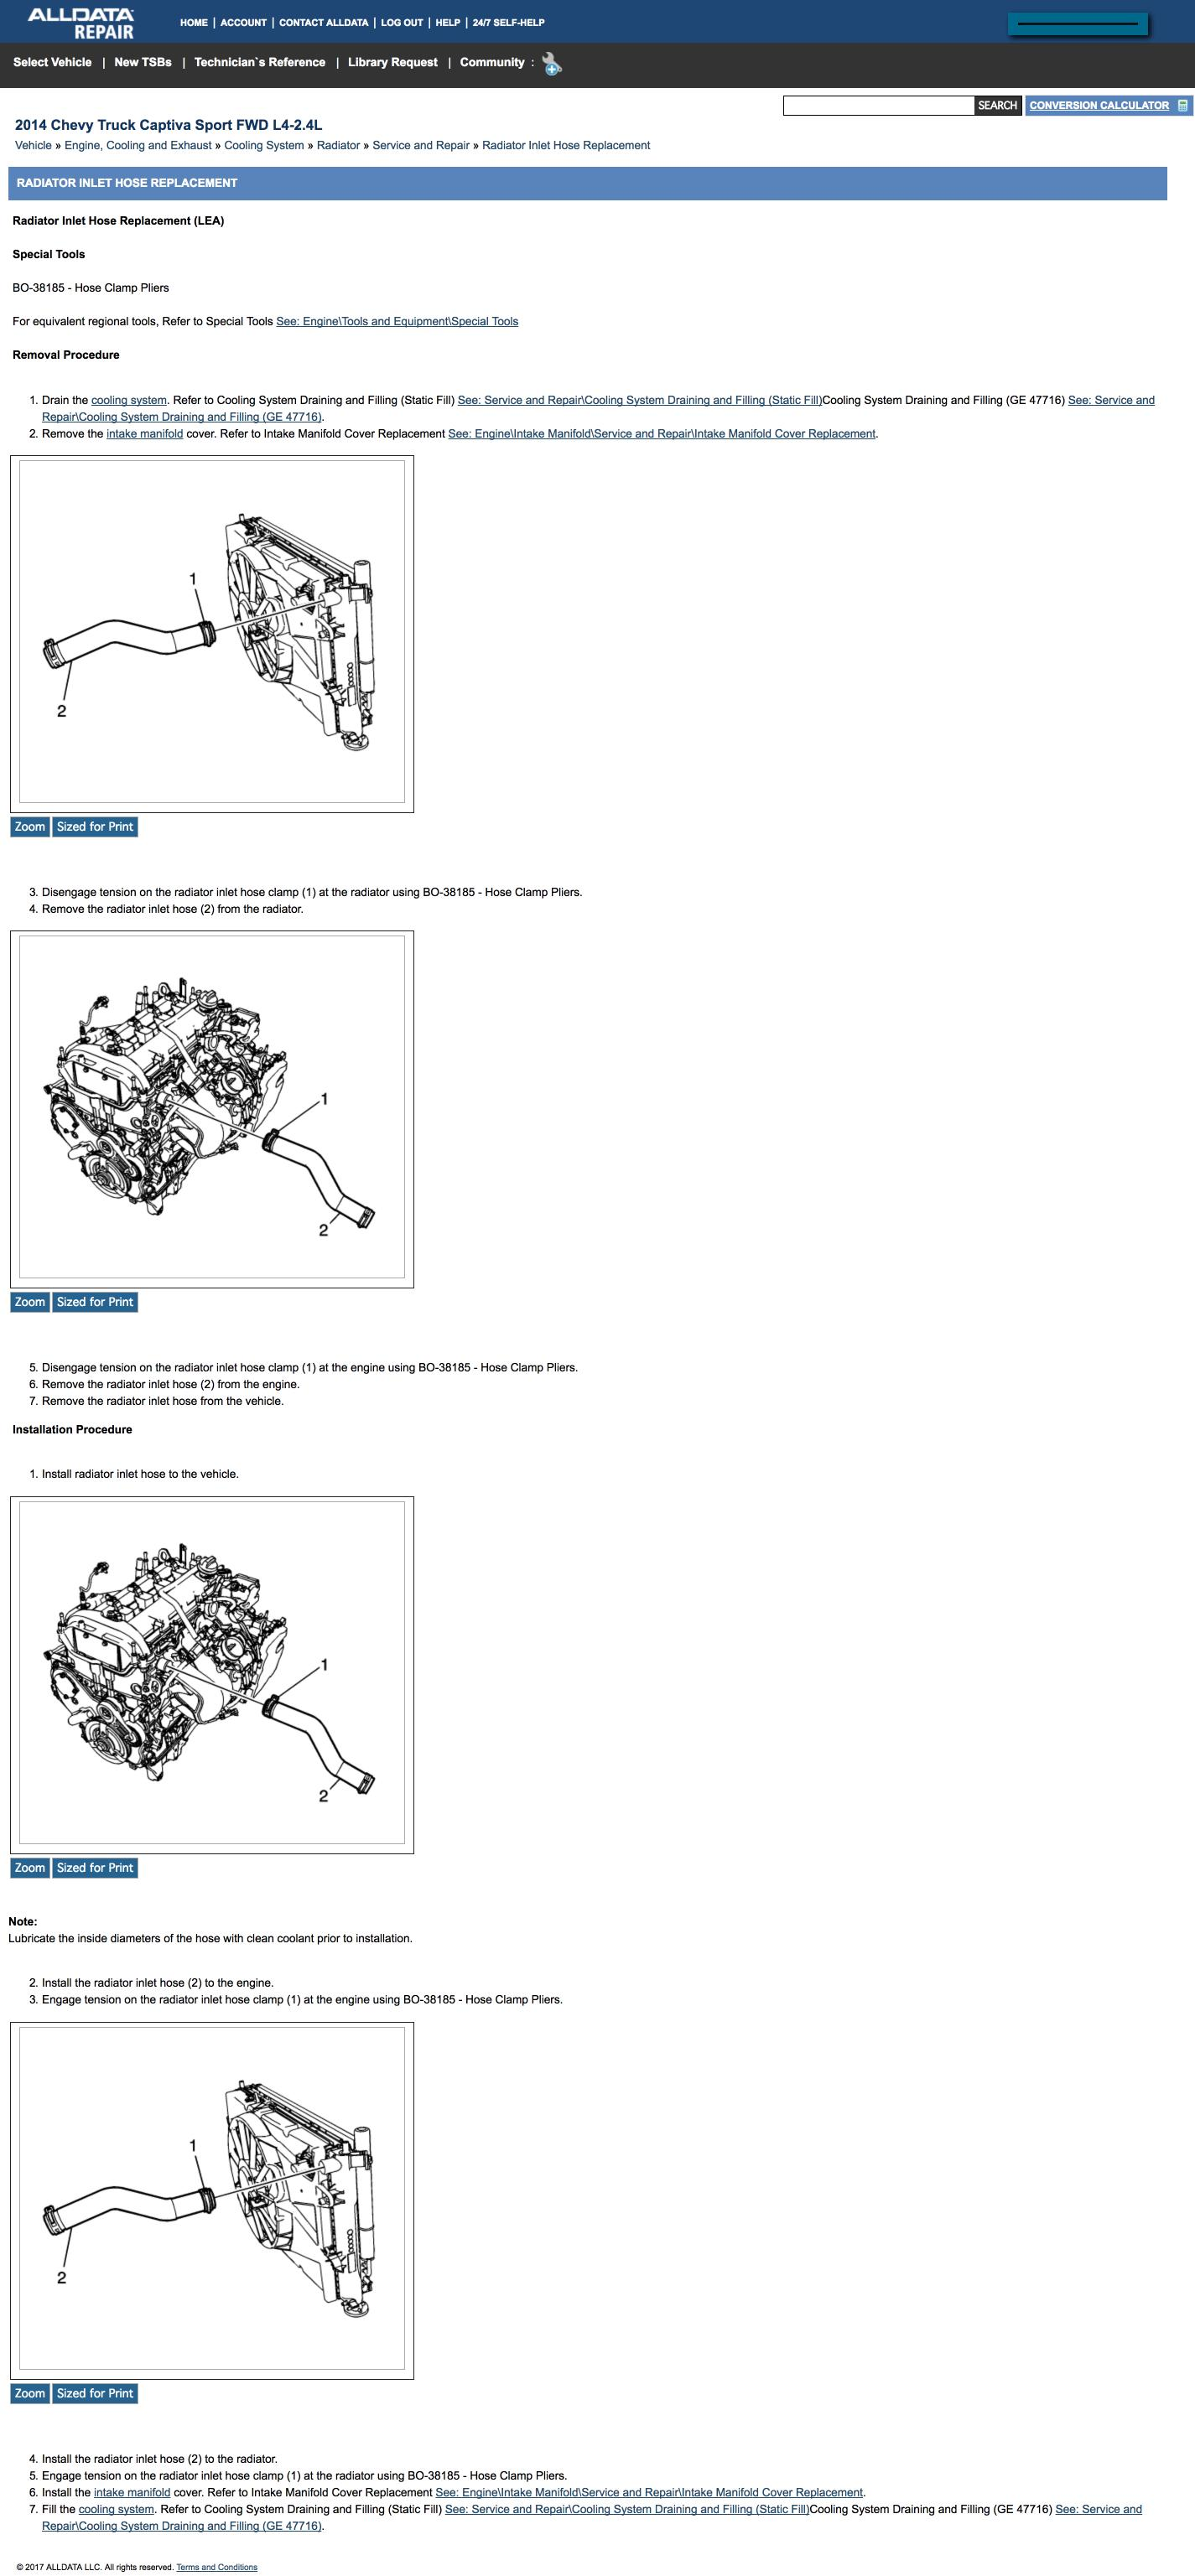 2013 Chevy Captiva Camshaft Position Sensor Location